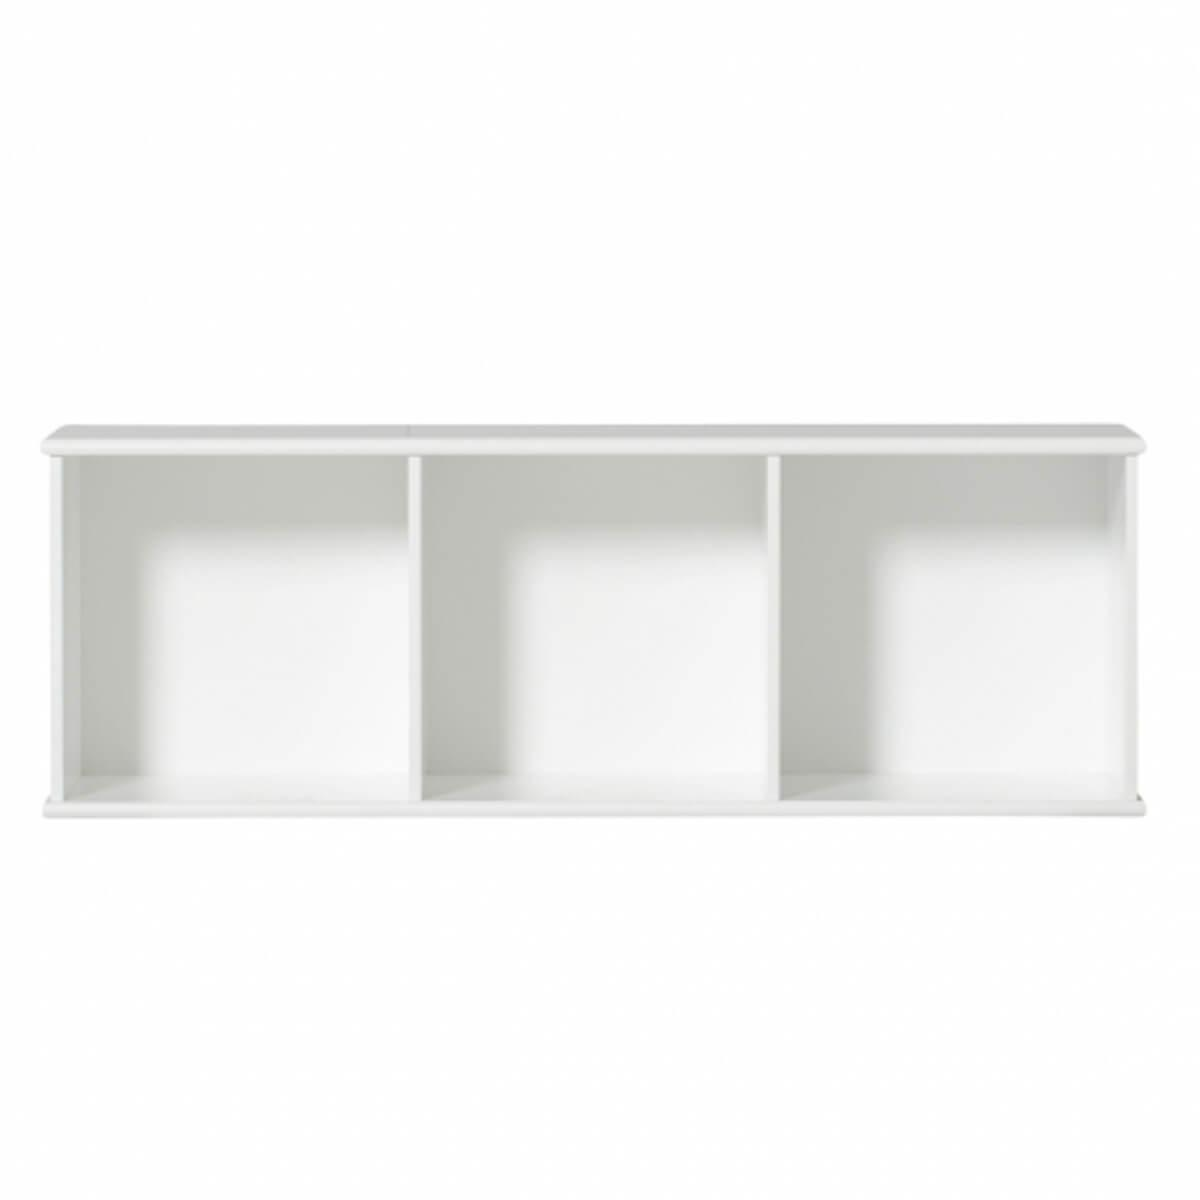 Meuble-banquette 106x43cm WOOD Oliver Furniture blanc